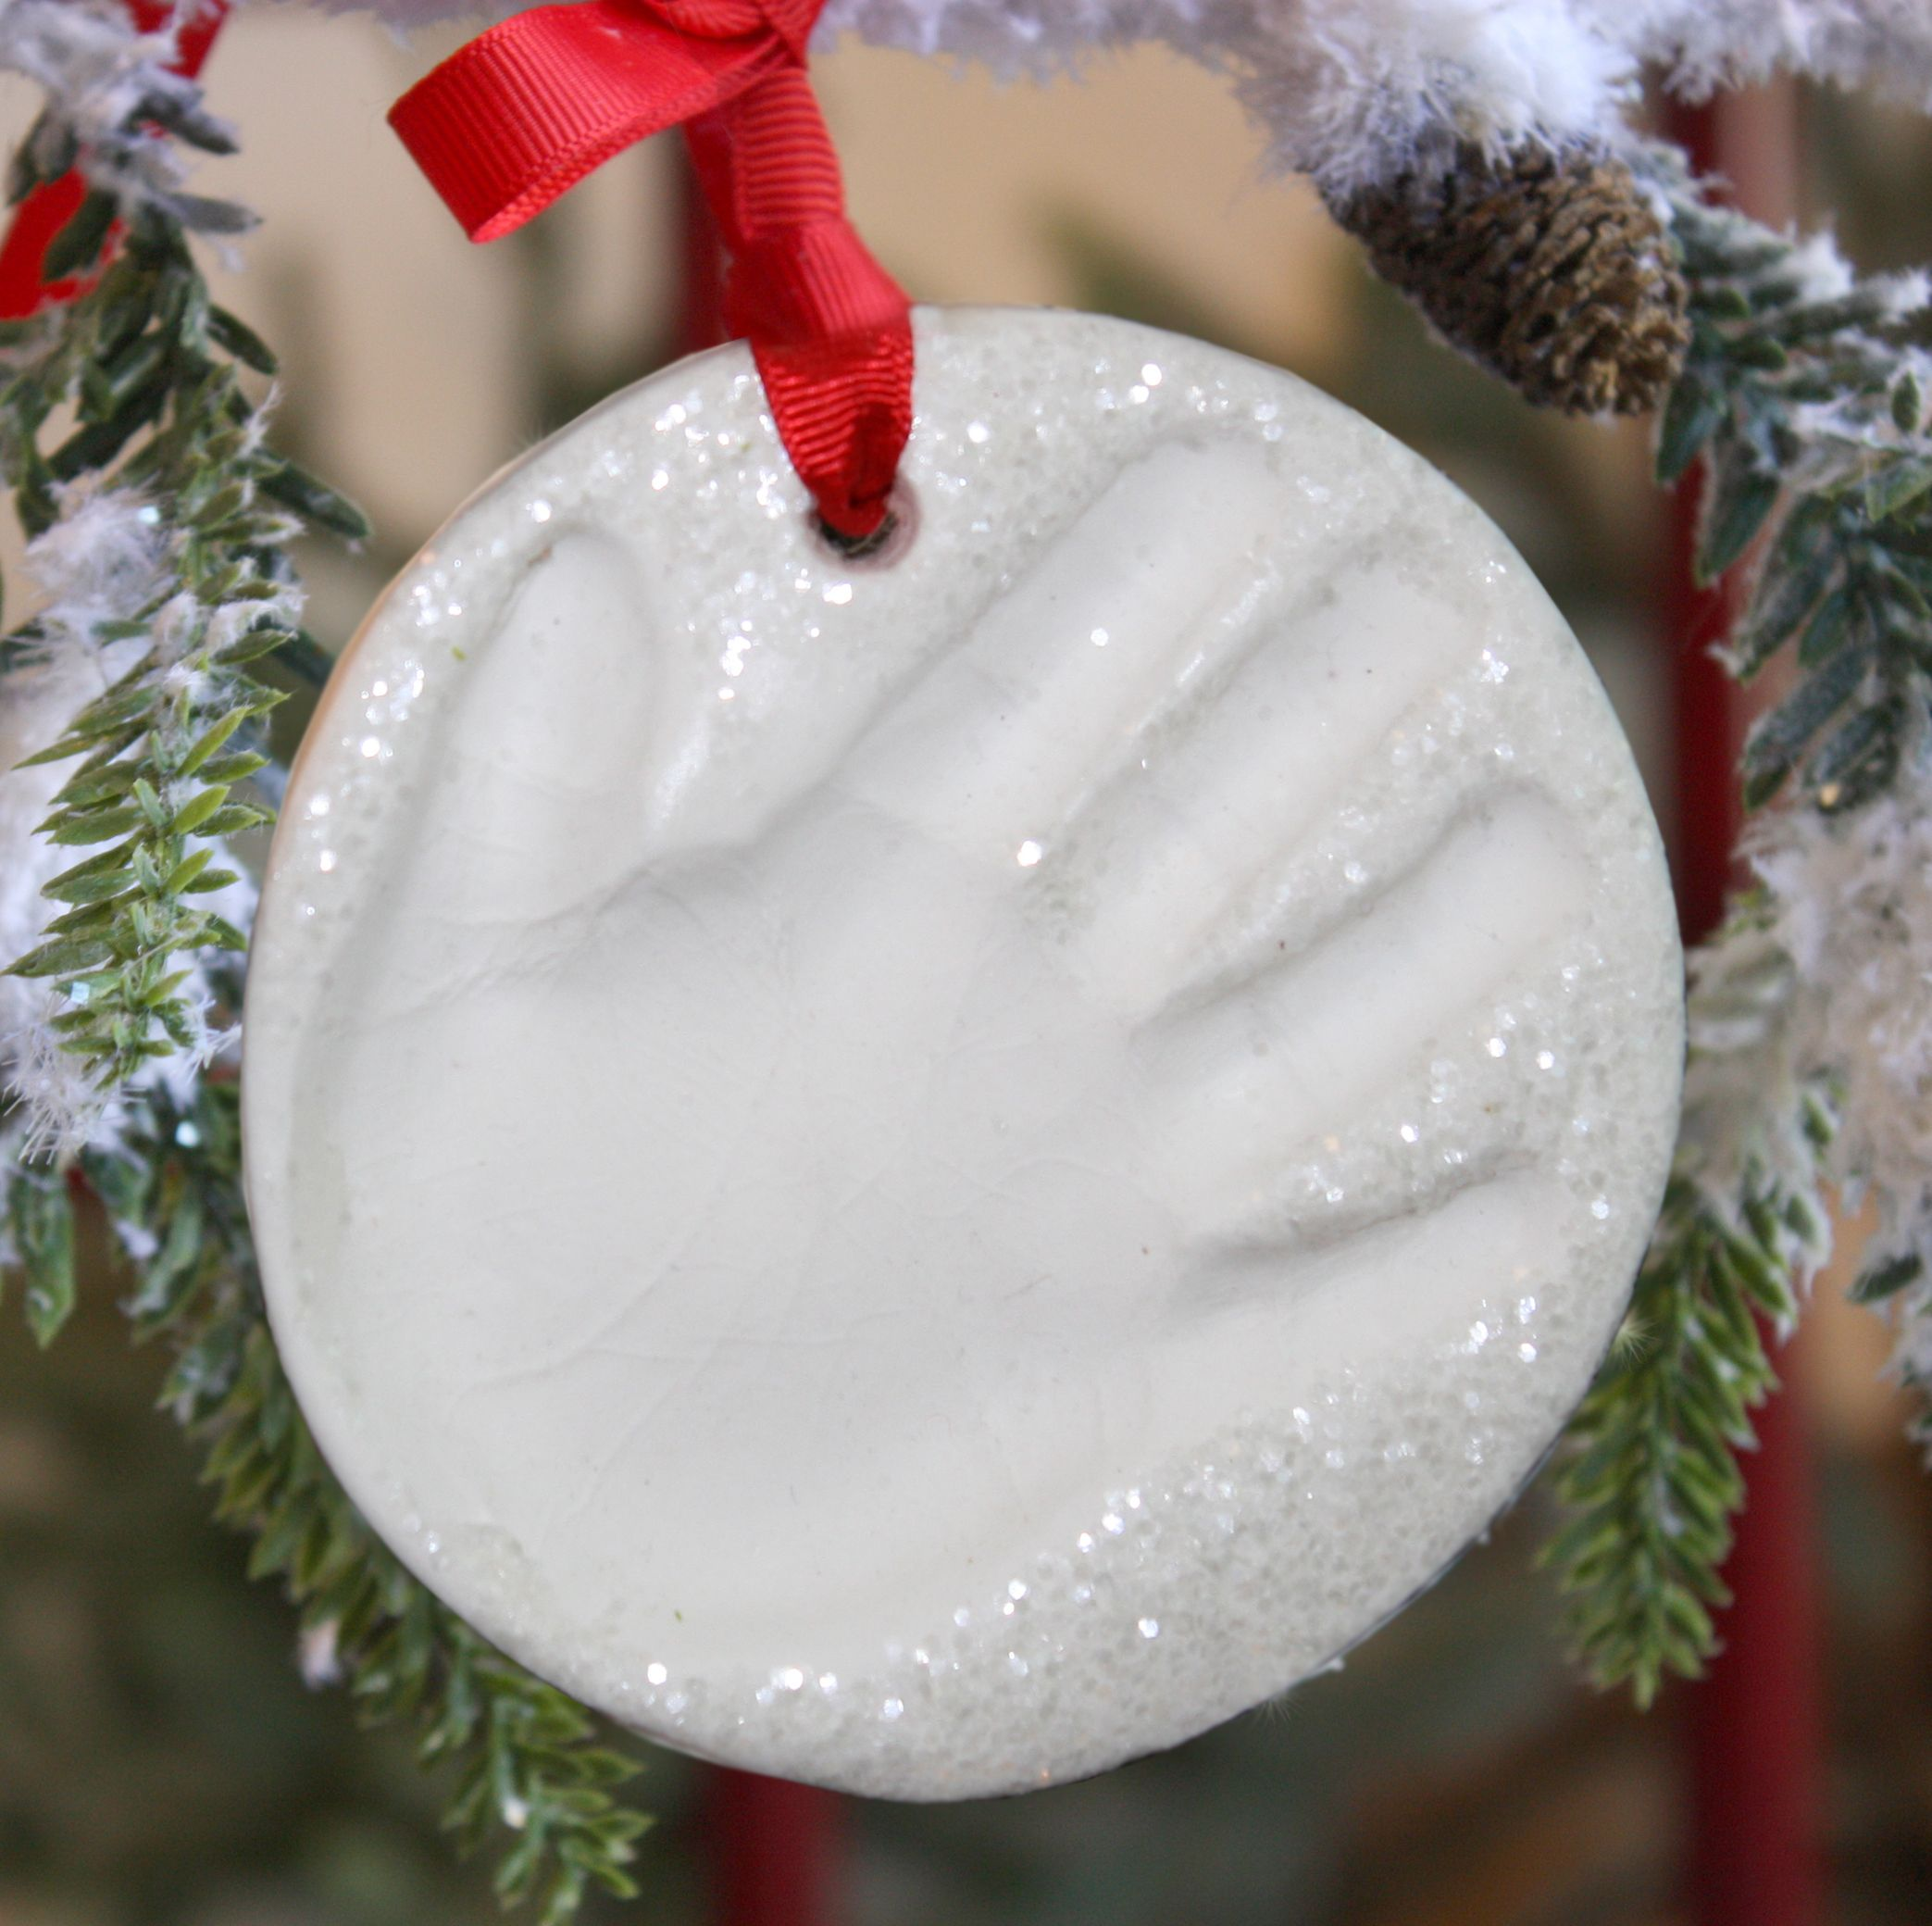 Child To Cherish Snowprints Handprint Ornament Kit Handprint Ornaments Baby Handprint Handprint Christmas